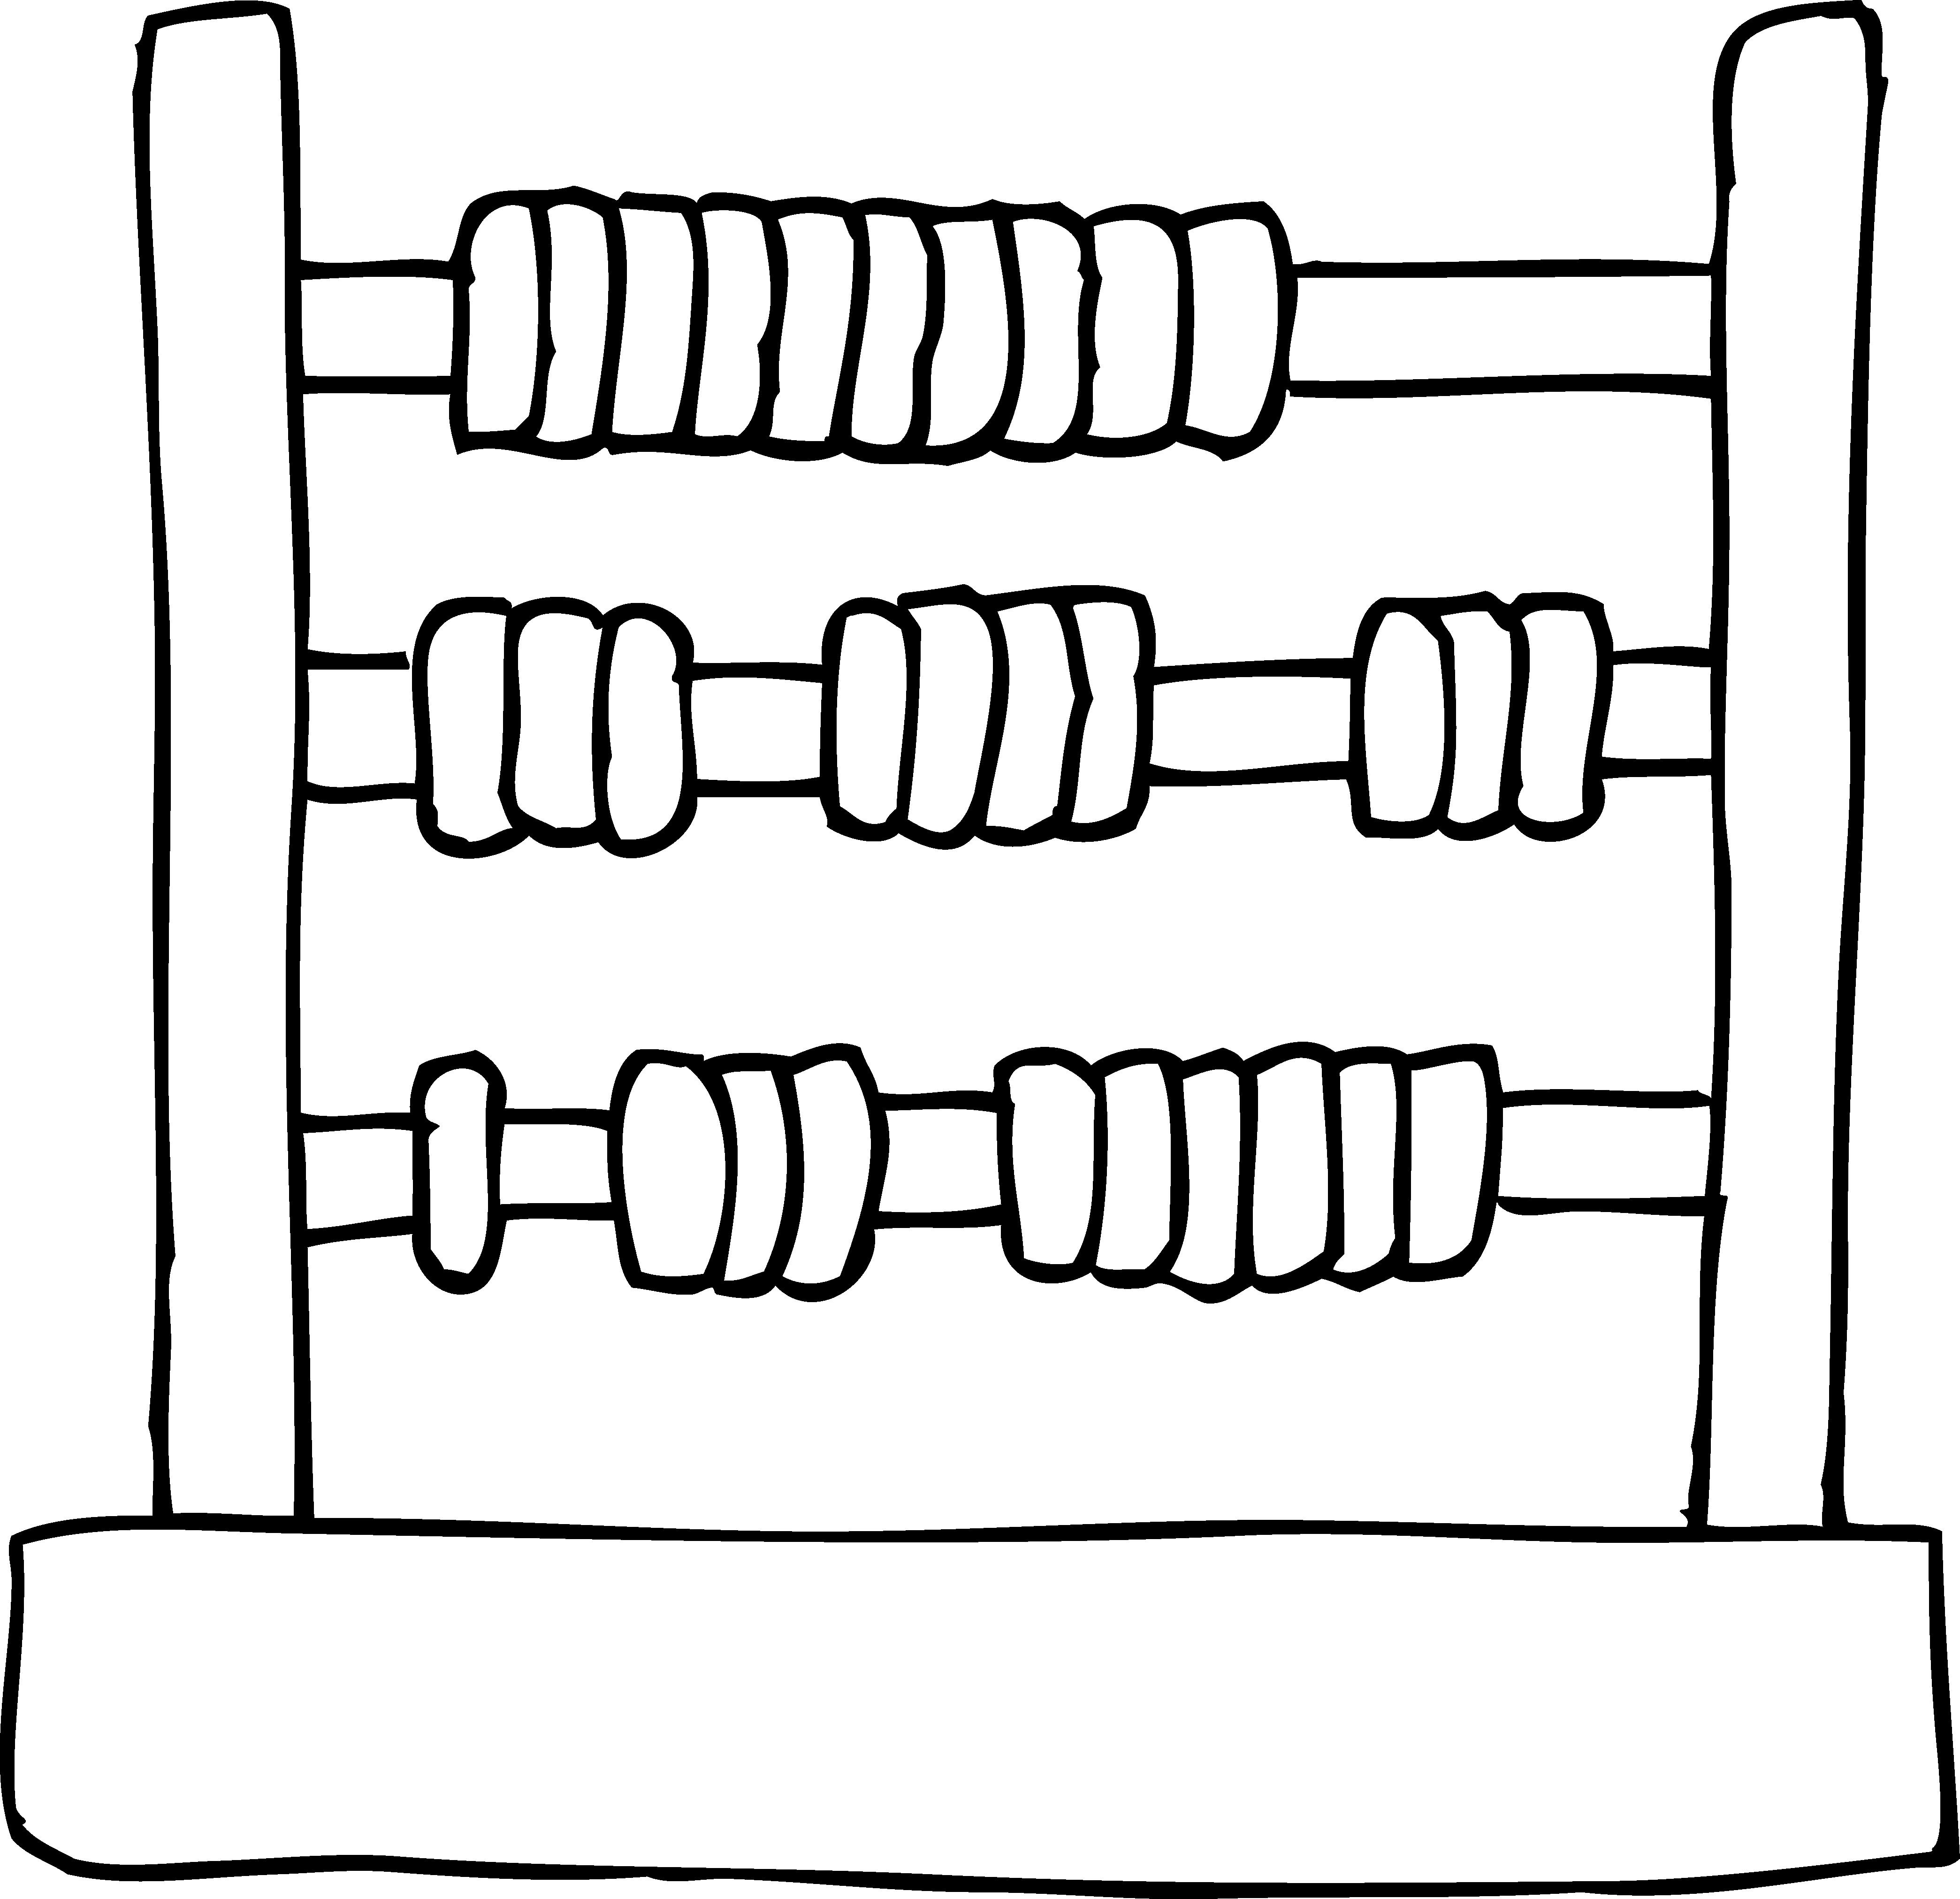 Monochrome clipart math #14